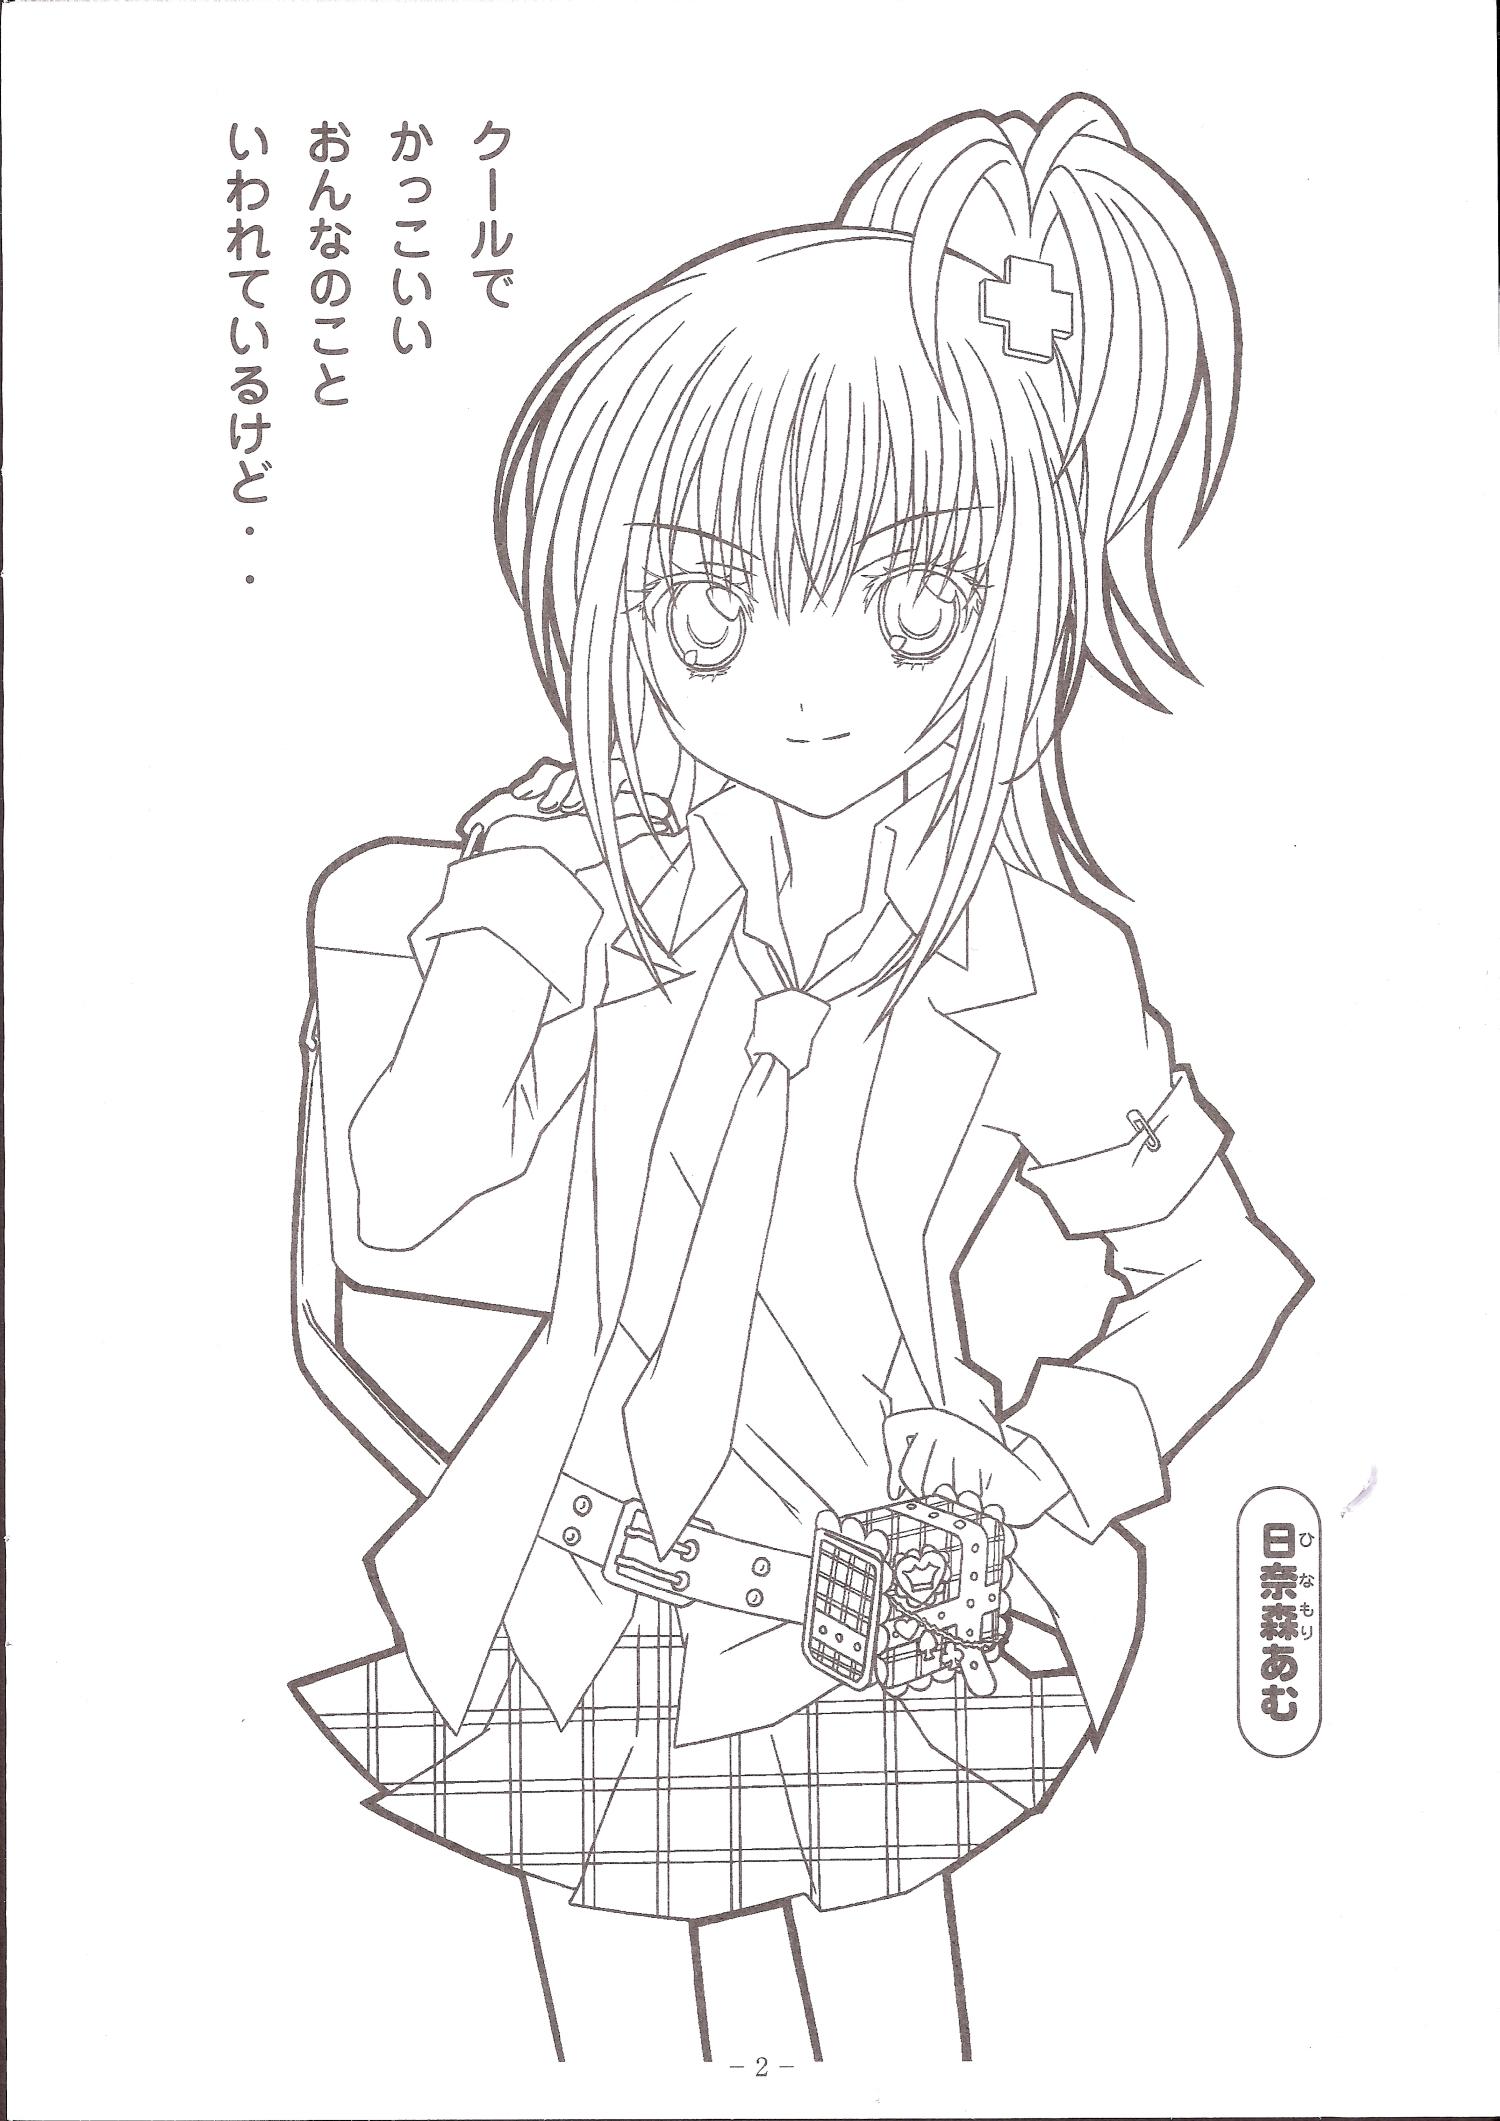 shugo chara coloring pages - photo#12